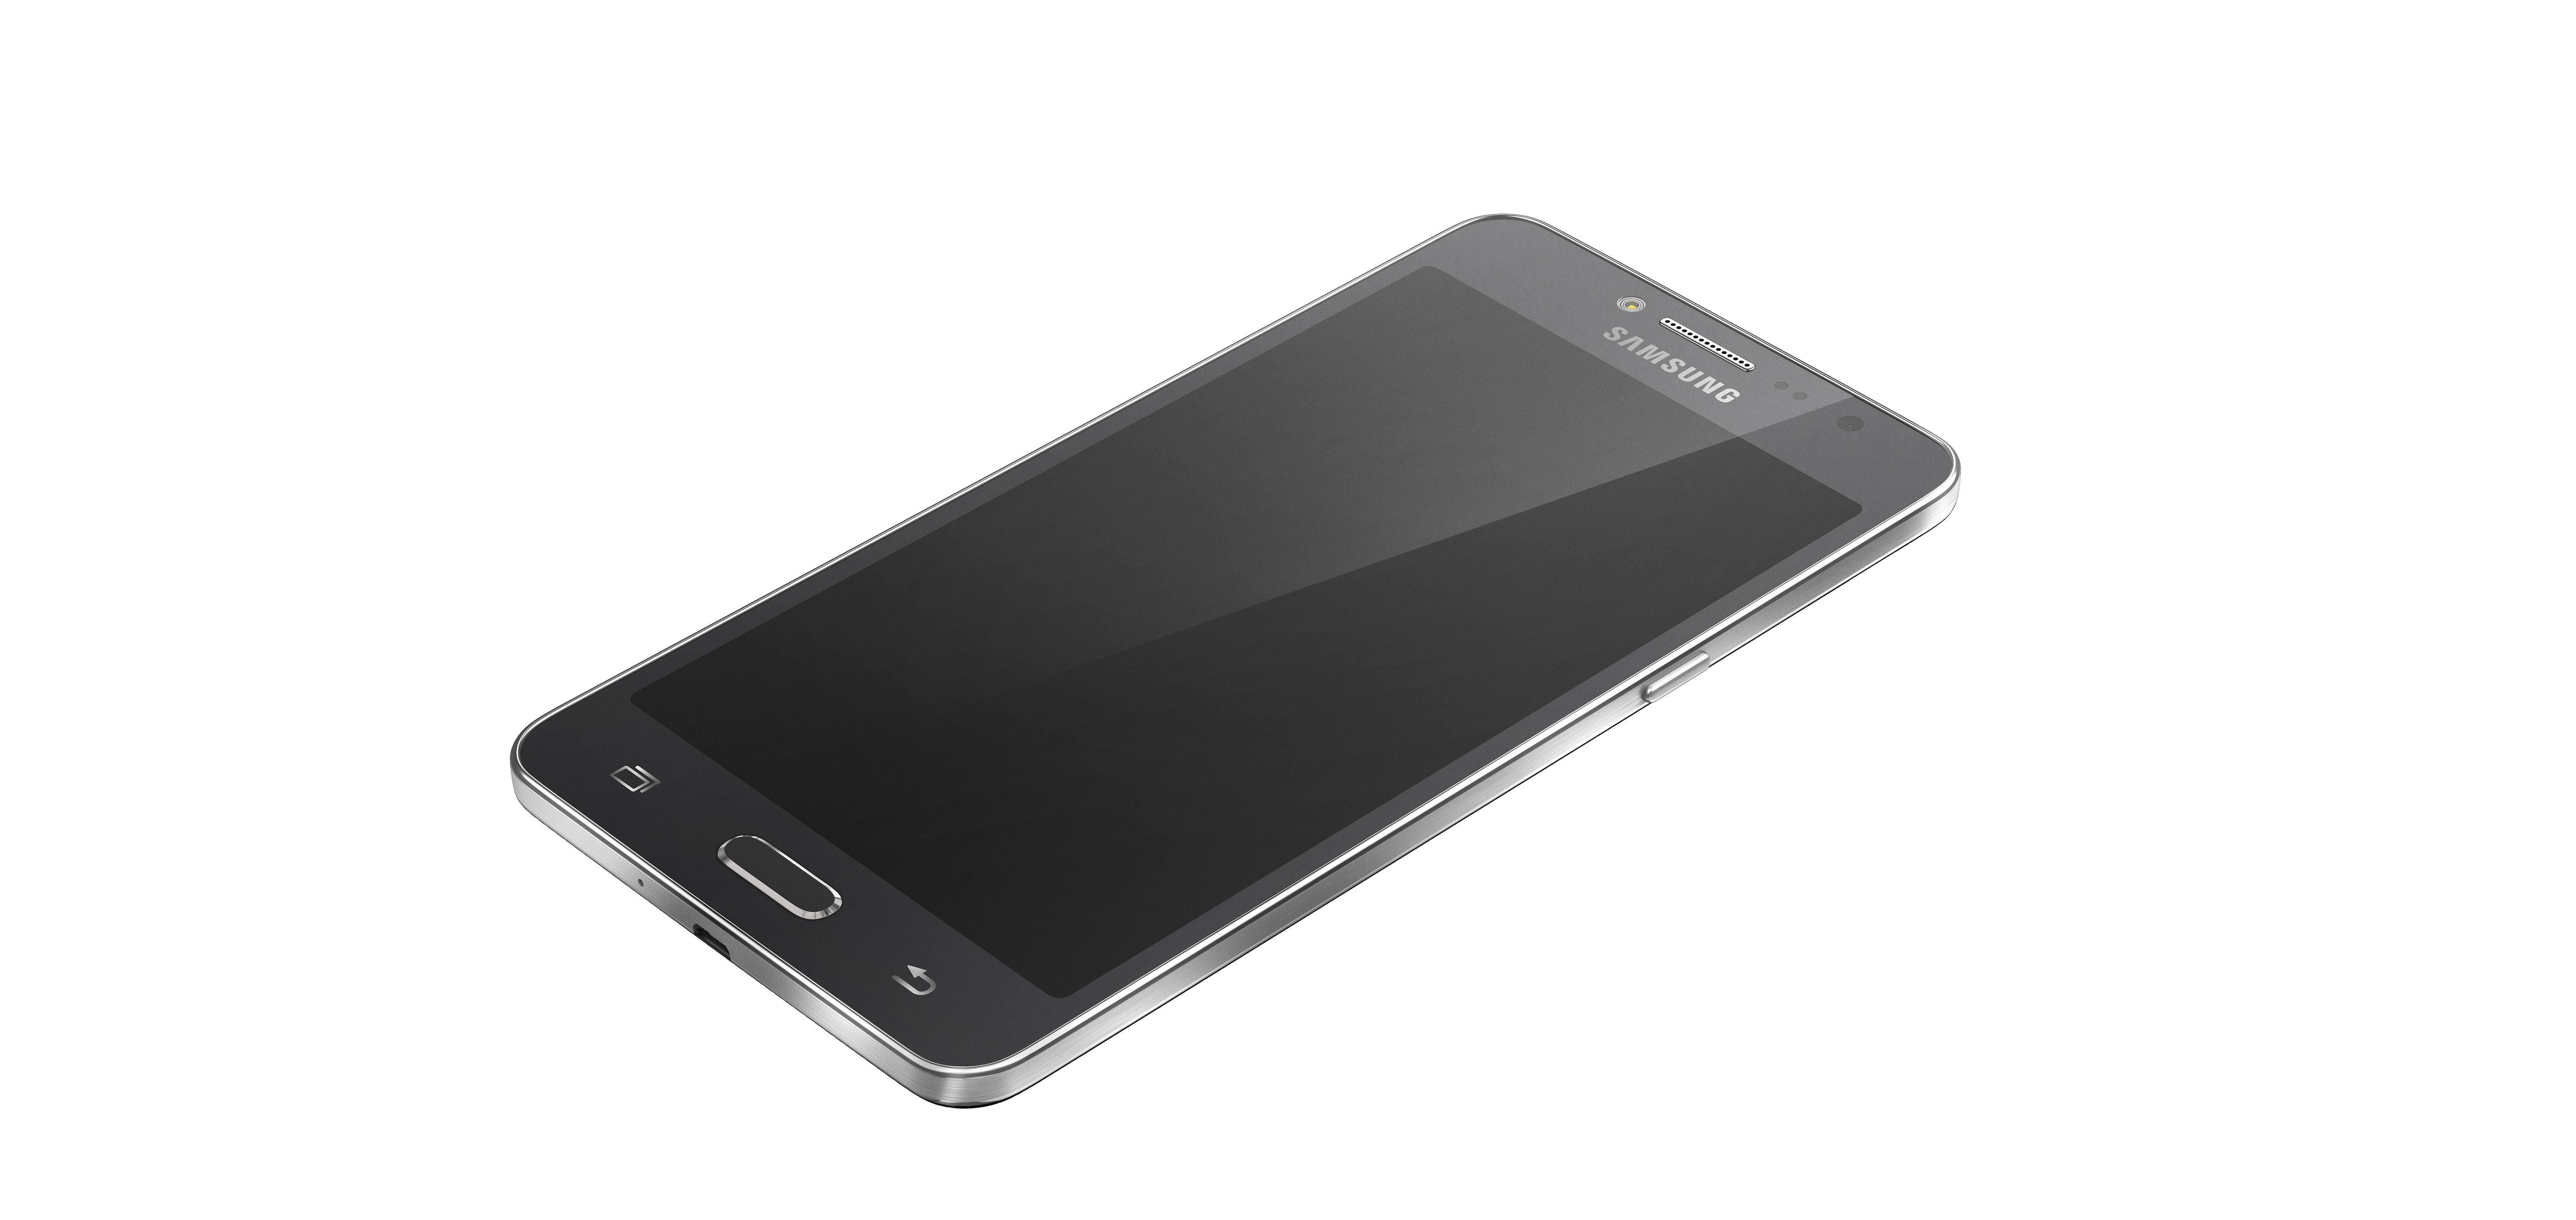 24ab94b5afb Samsung Strengthens 4G Leadership with Galaxy J2 Ace, Galaxy J1 4G ...